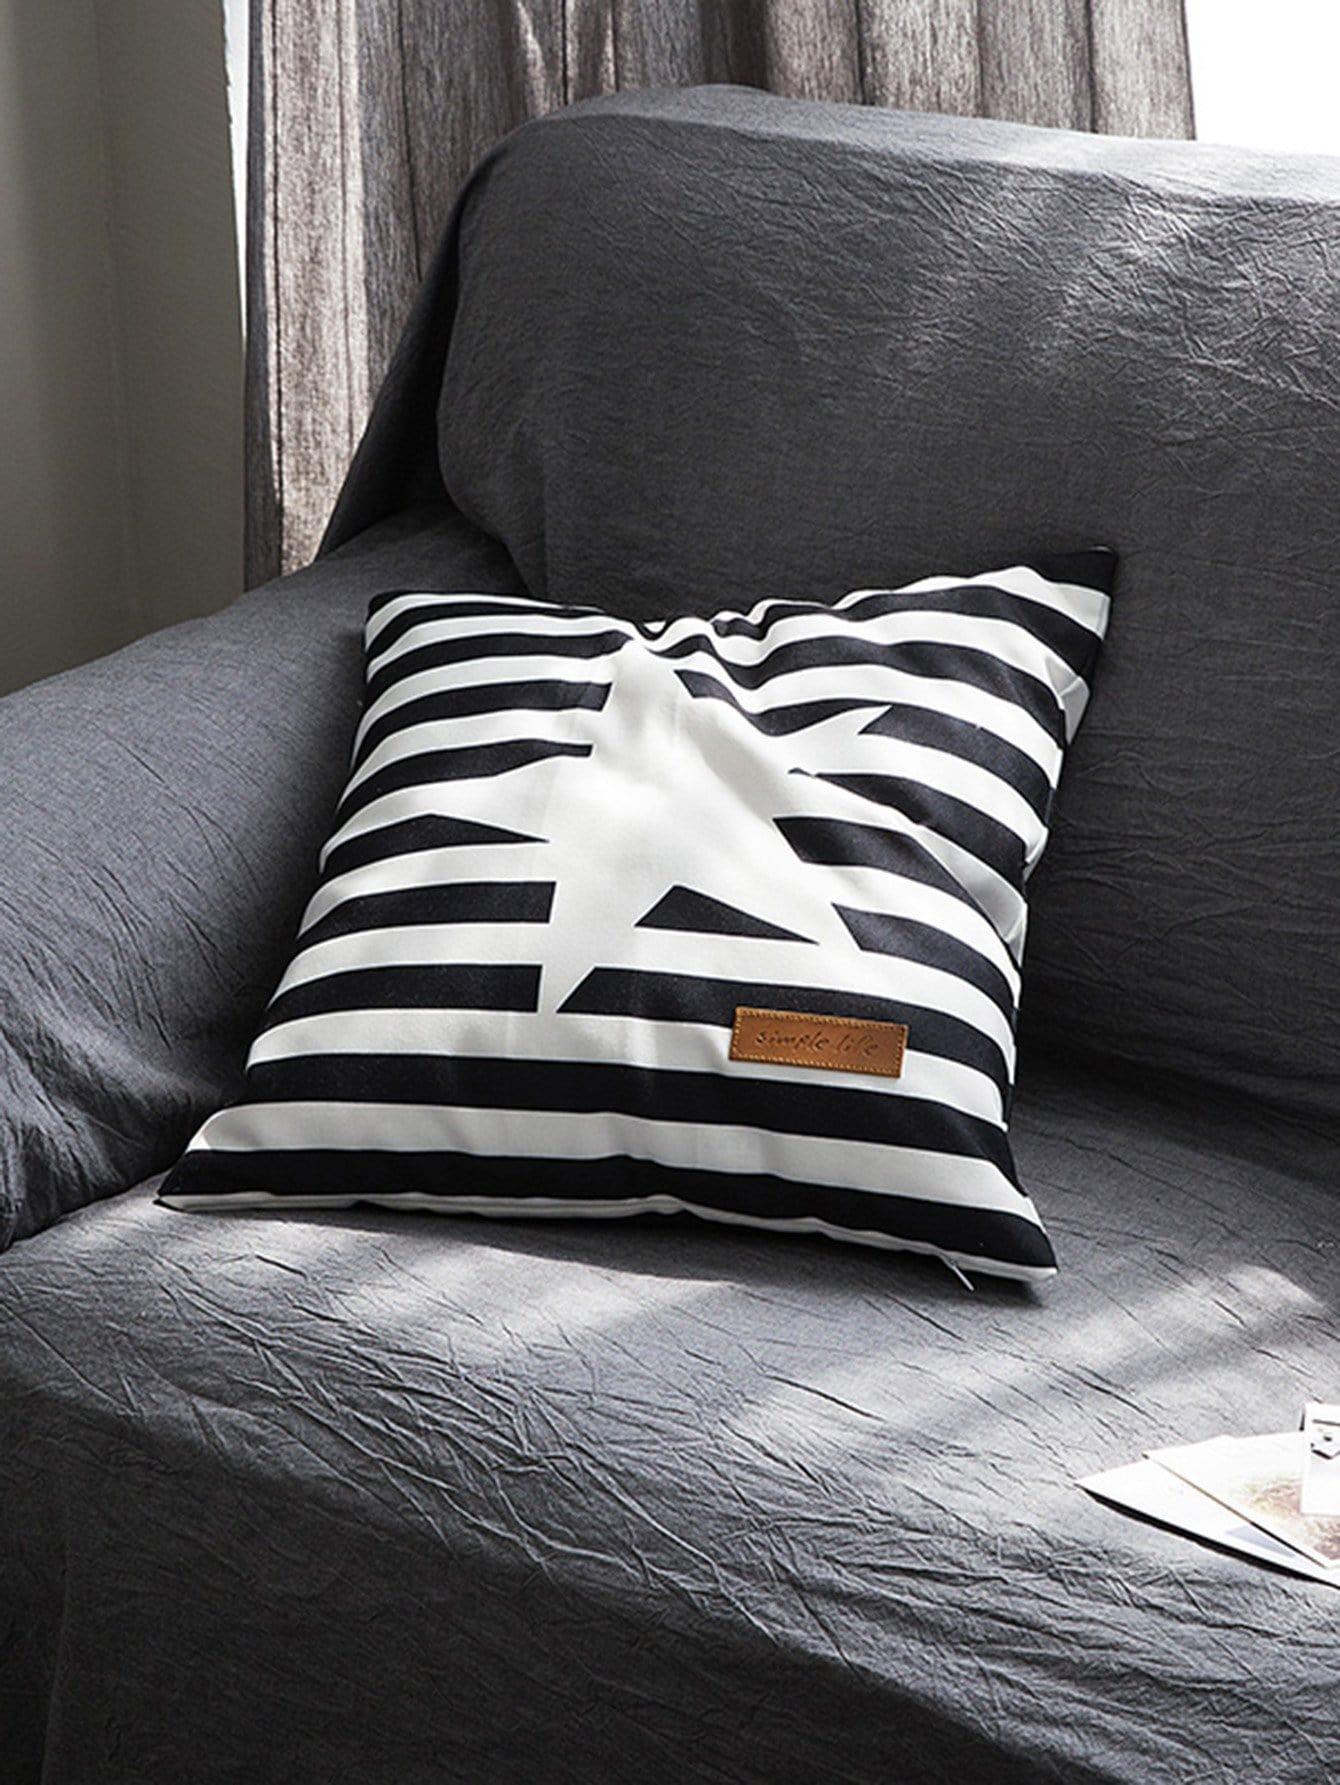 Striped & Star Print Pillowcase Cover 1PC